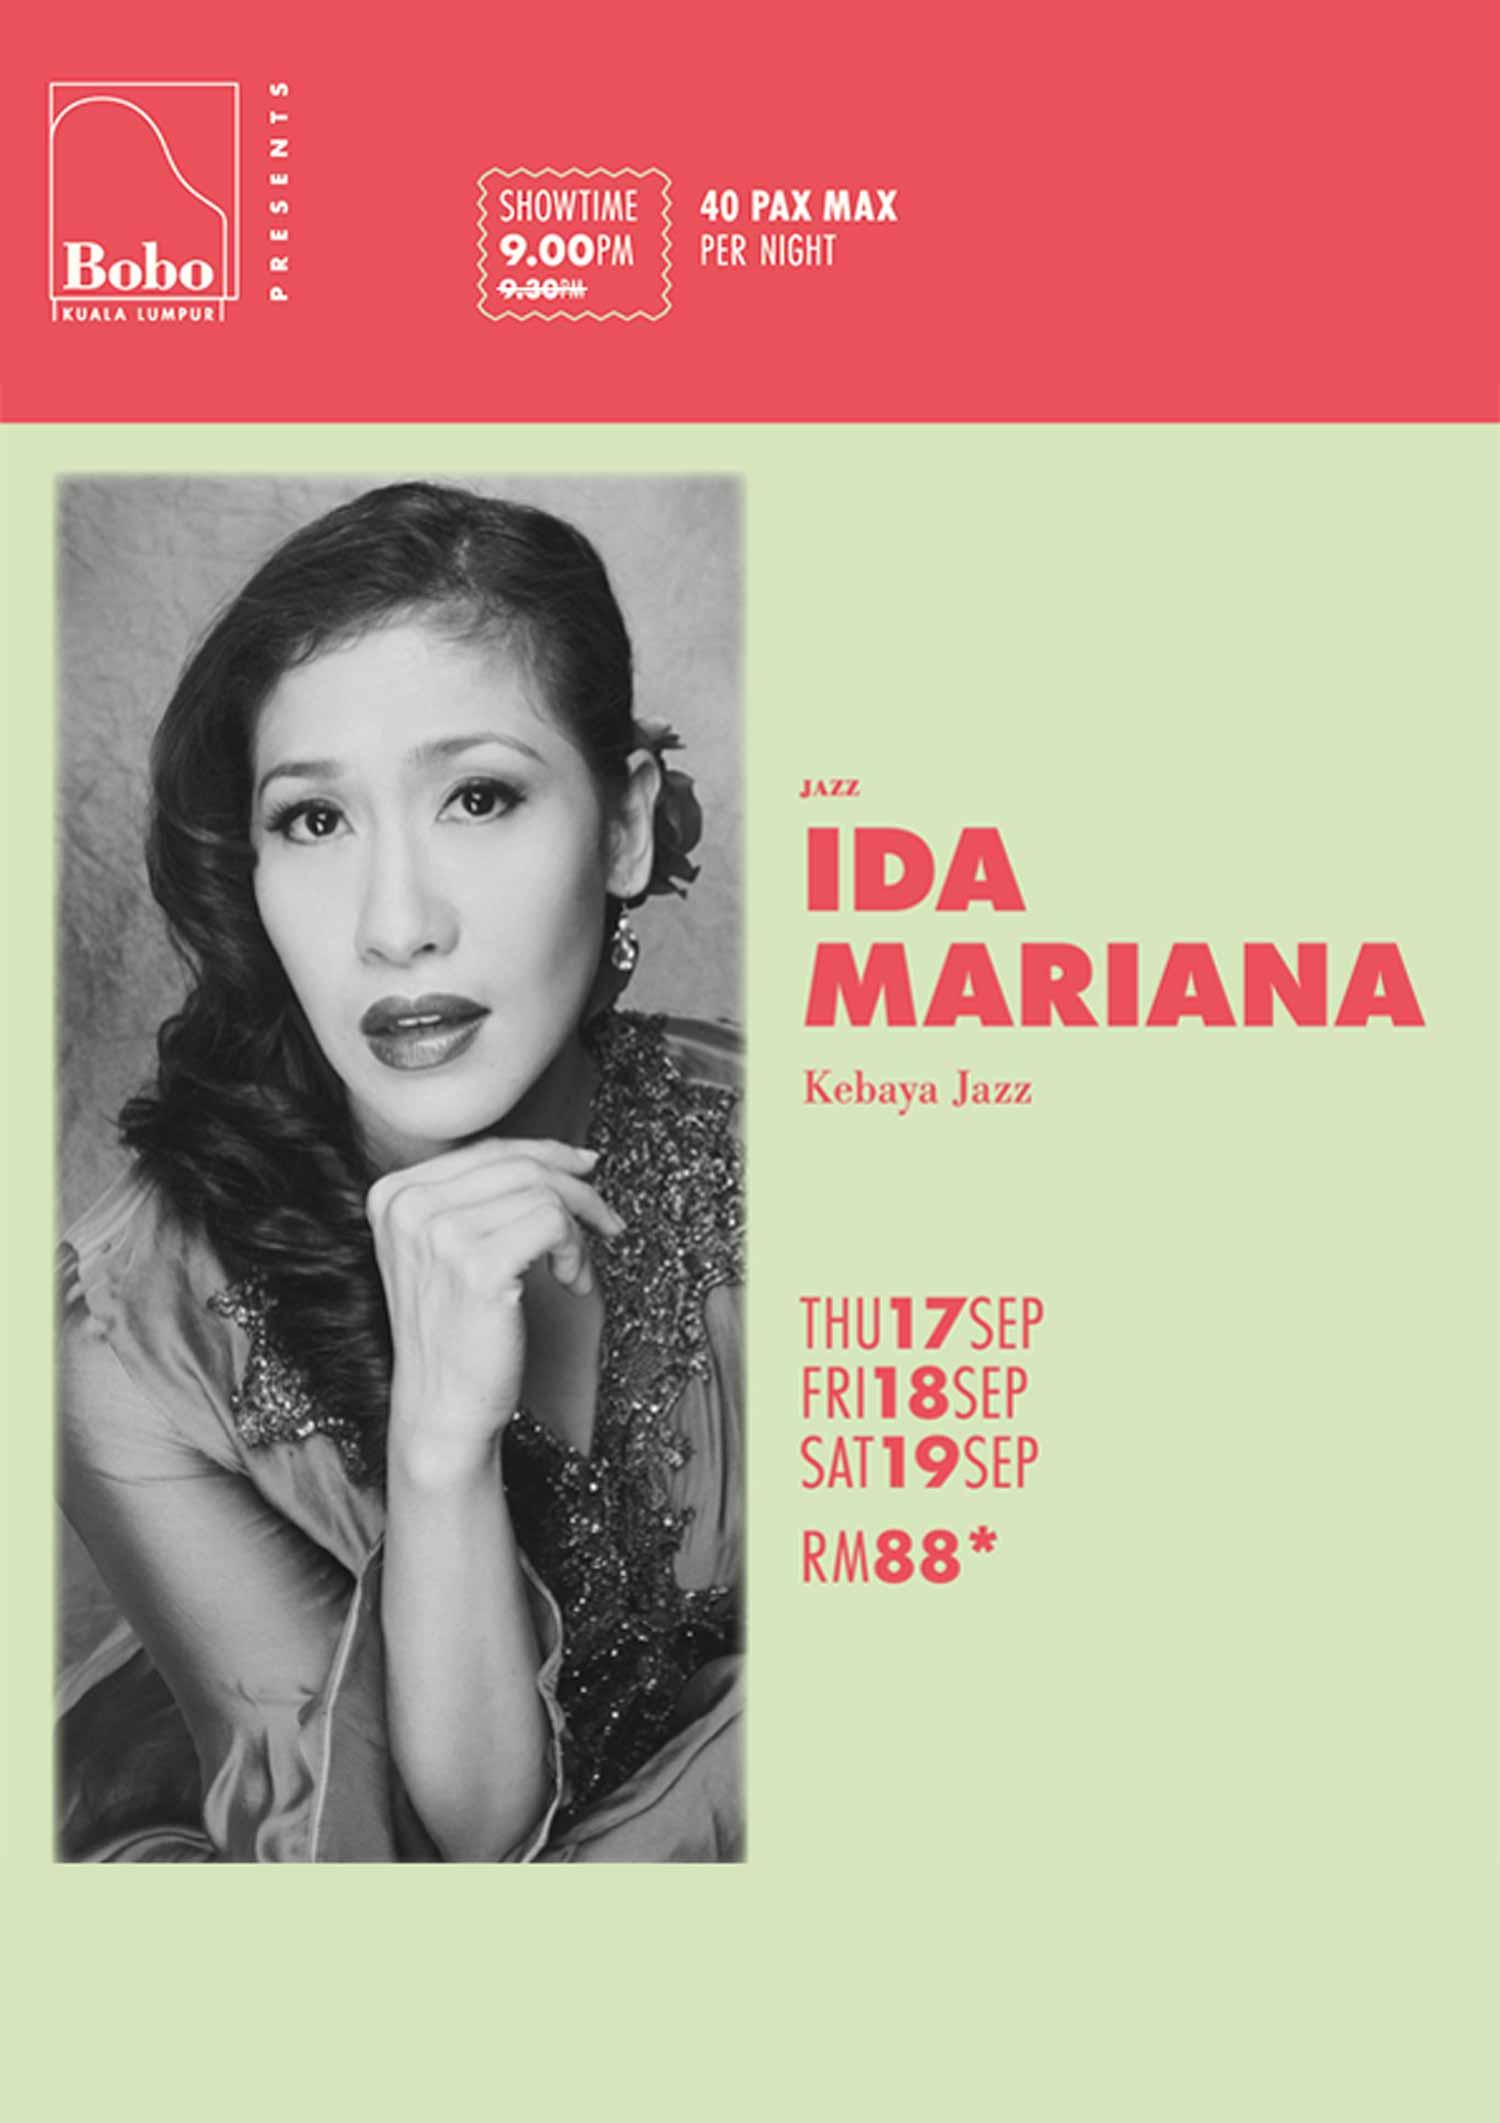 Ida Mariana Kebaya Jazz